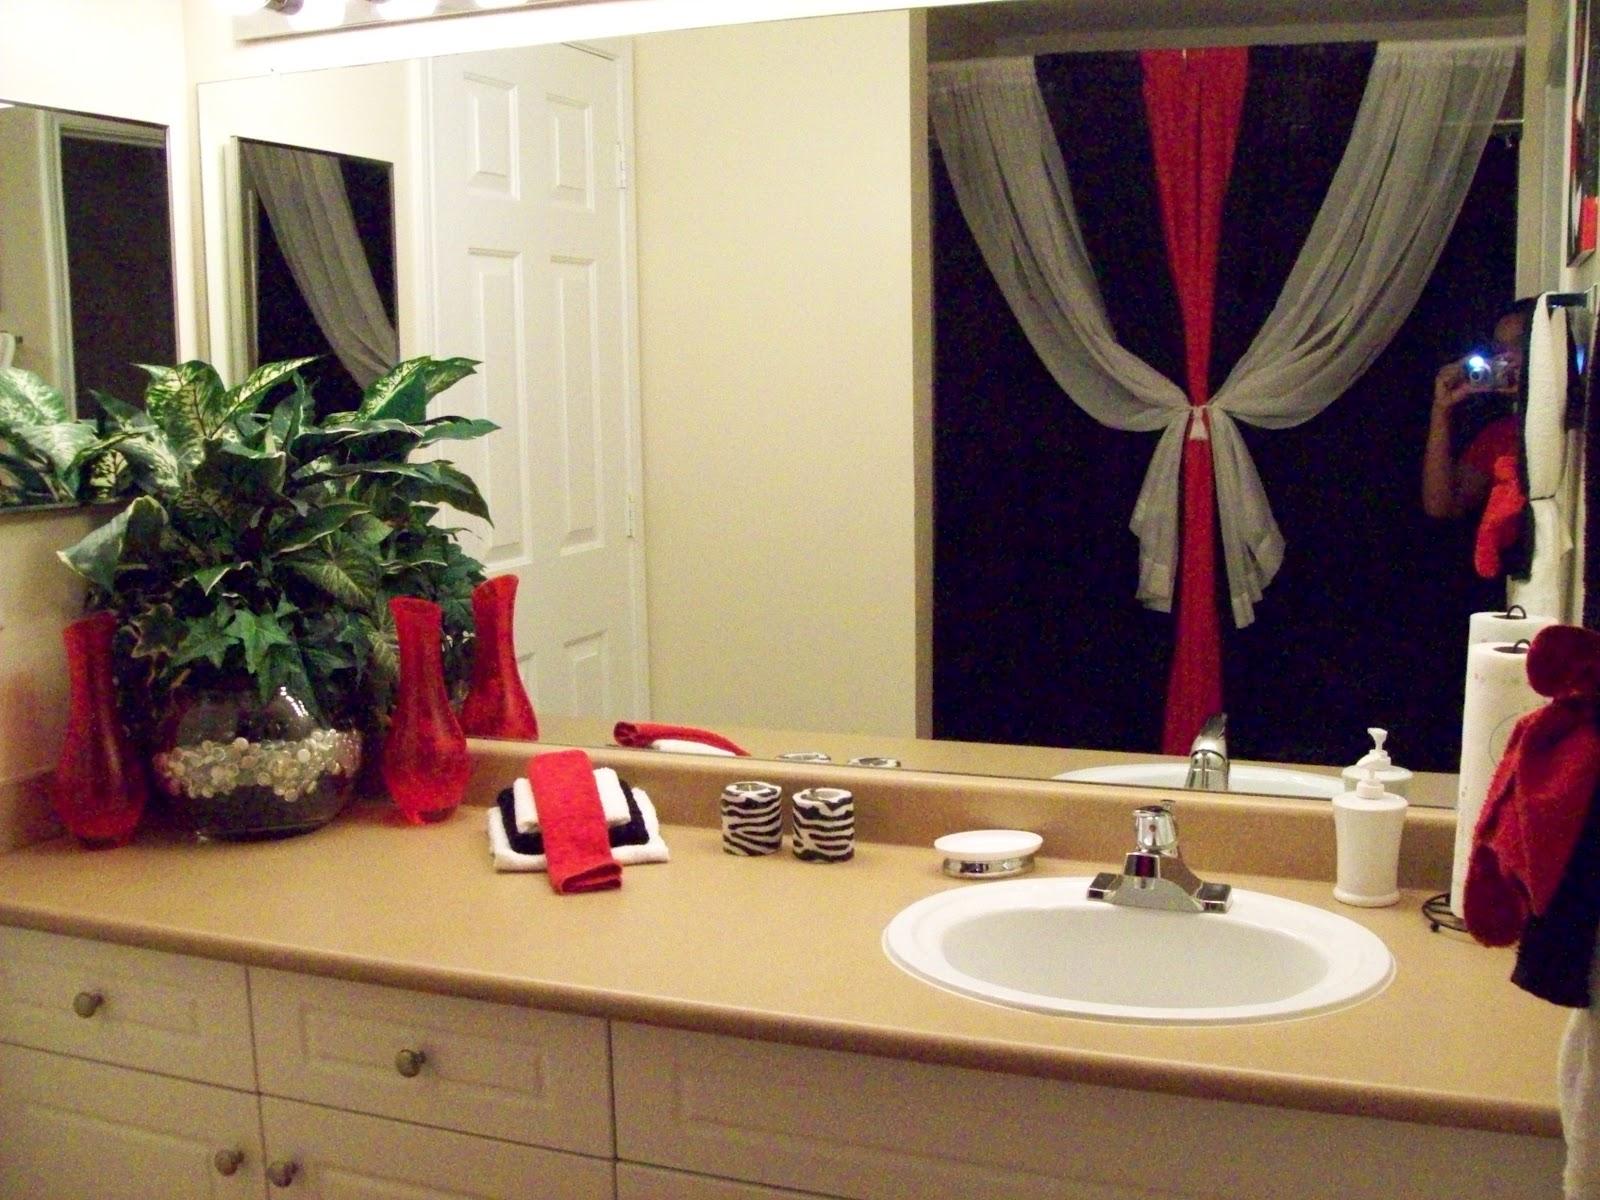 Diva bathroom decor